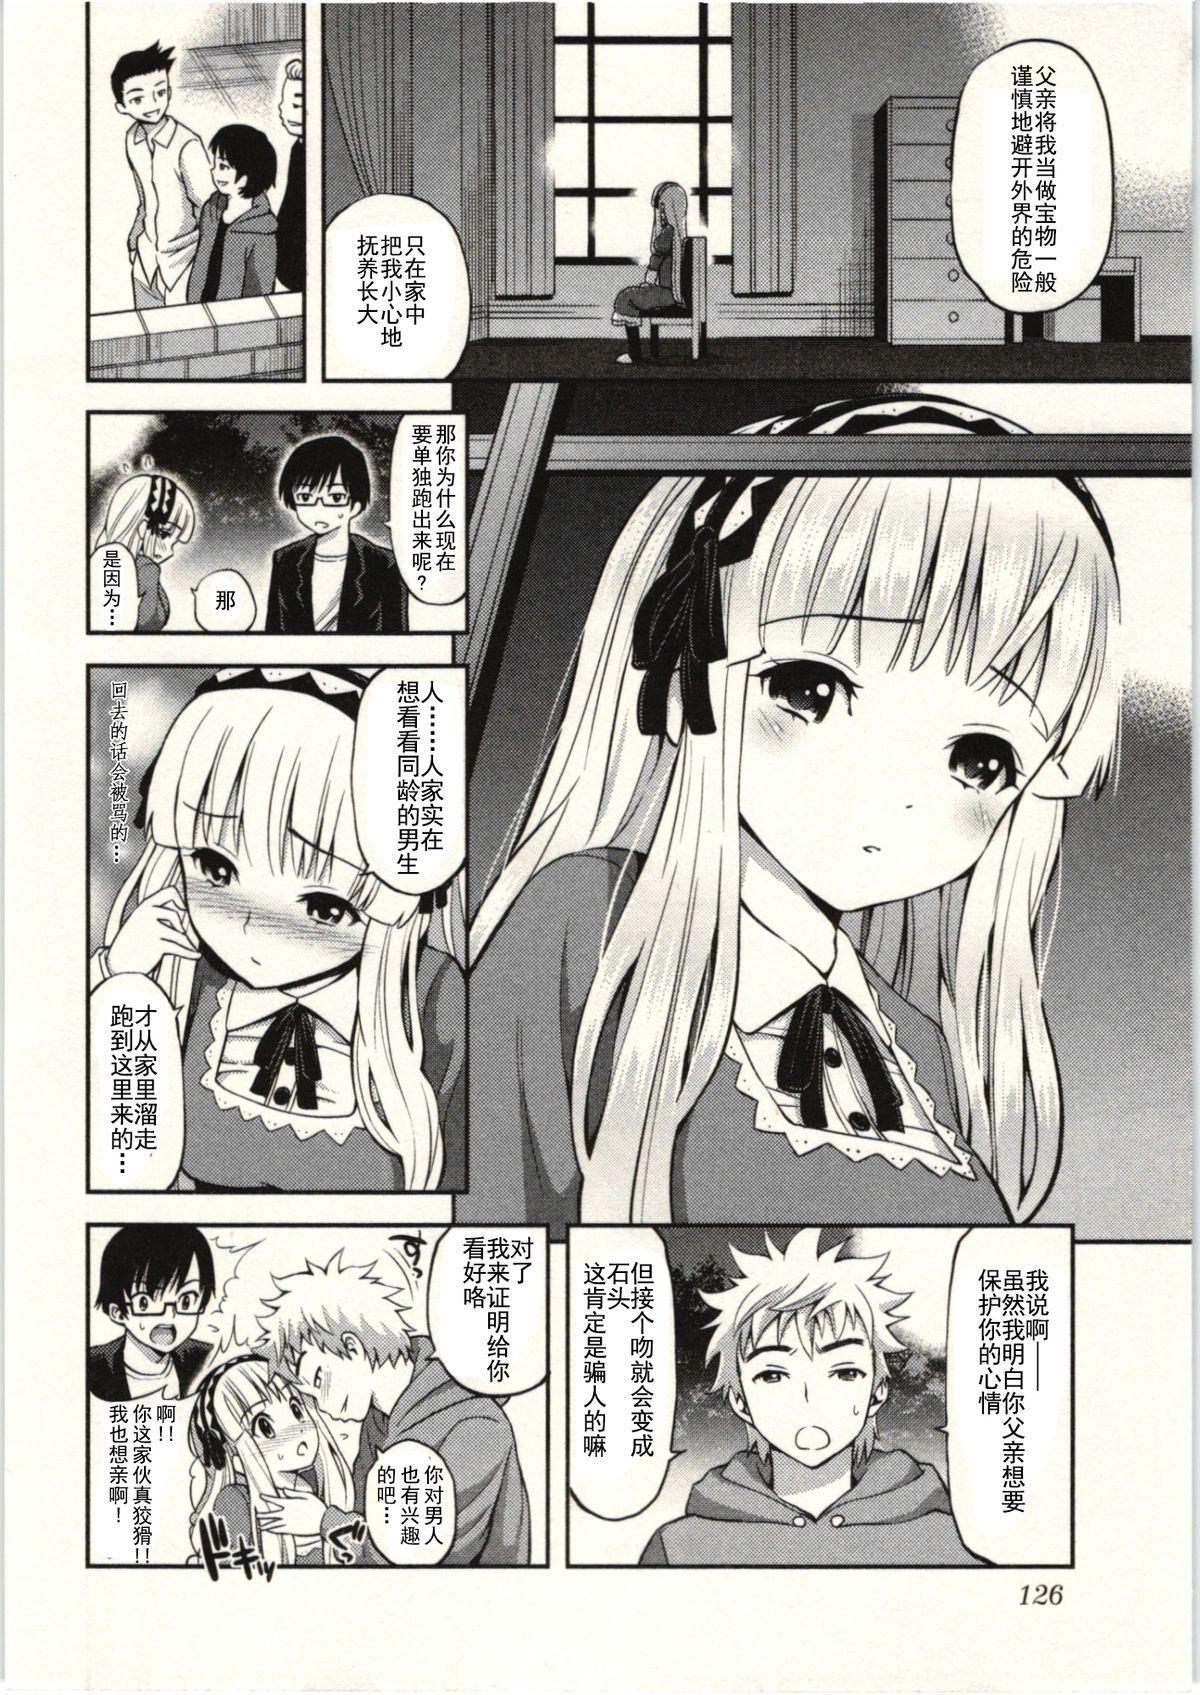 Tadashii Majutsu no Asobikata - The right way of playing of magic. 128